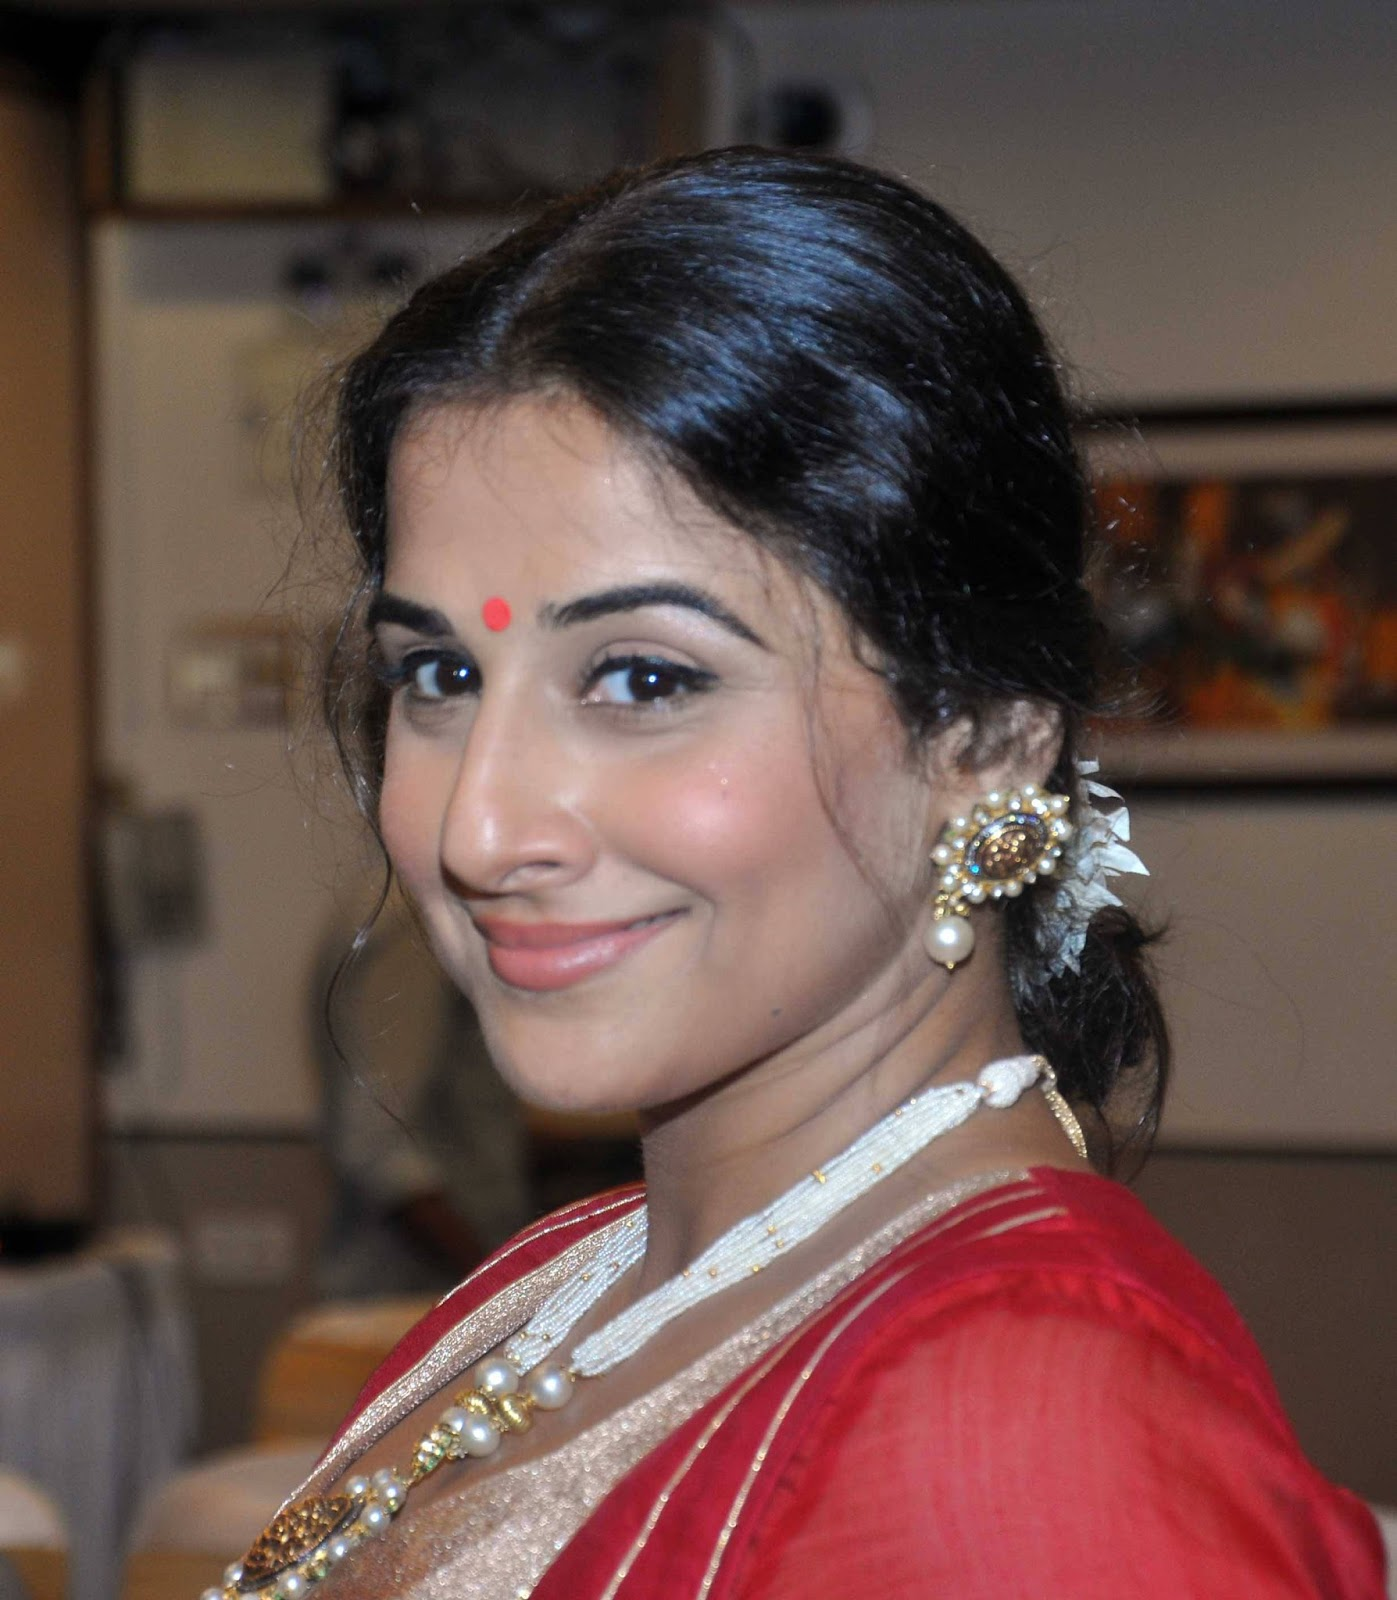 bollywood actress vidya balan unseen stills in red dress by indian girls whatsapp numbers